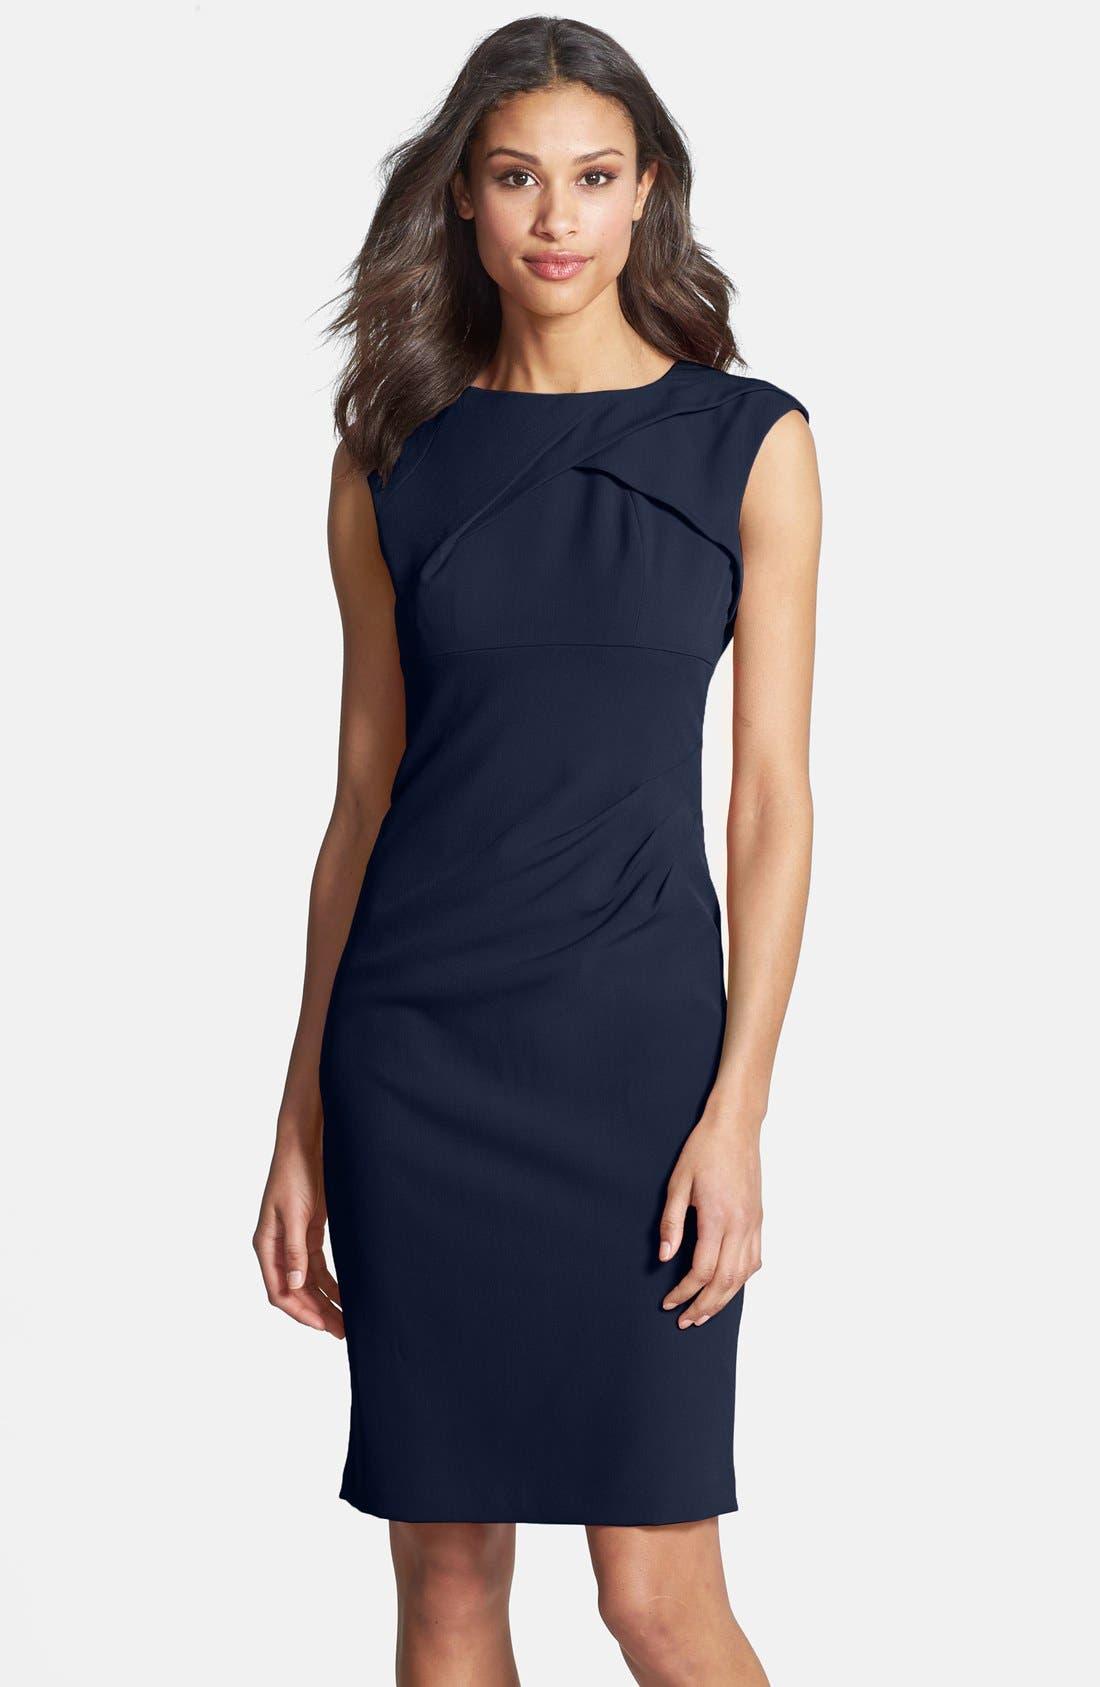 Alternate Image 1 Selected - Adrianna Papell Pleated Crepe Dress